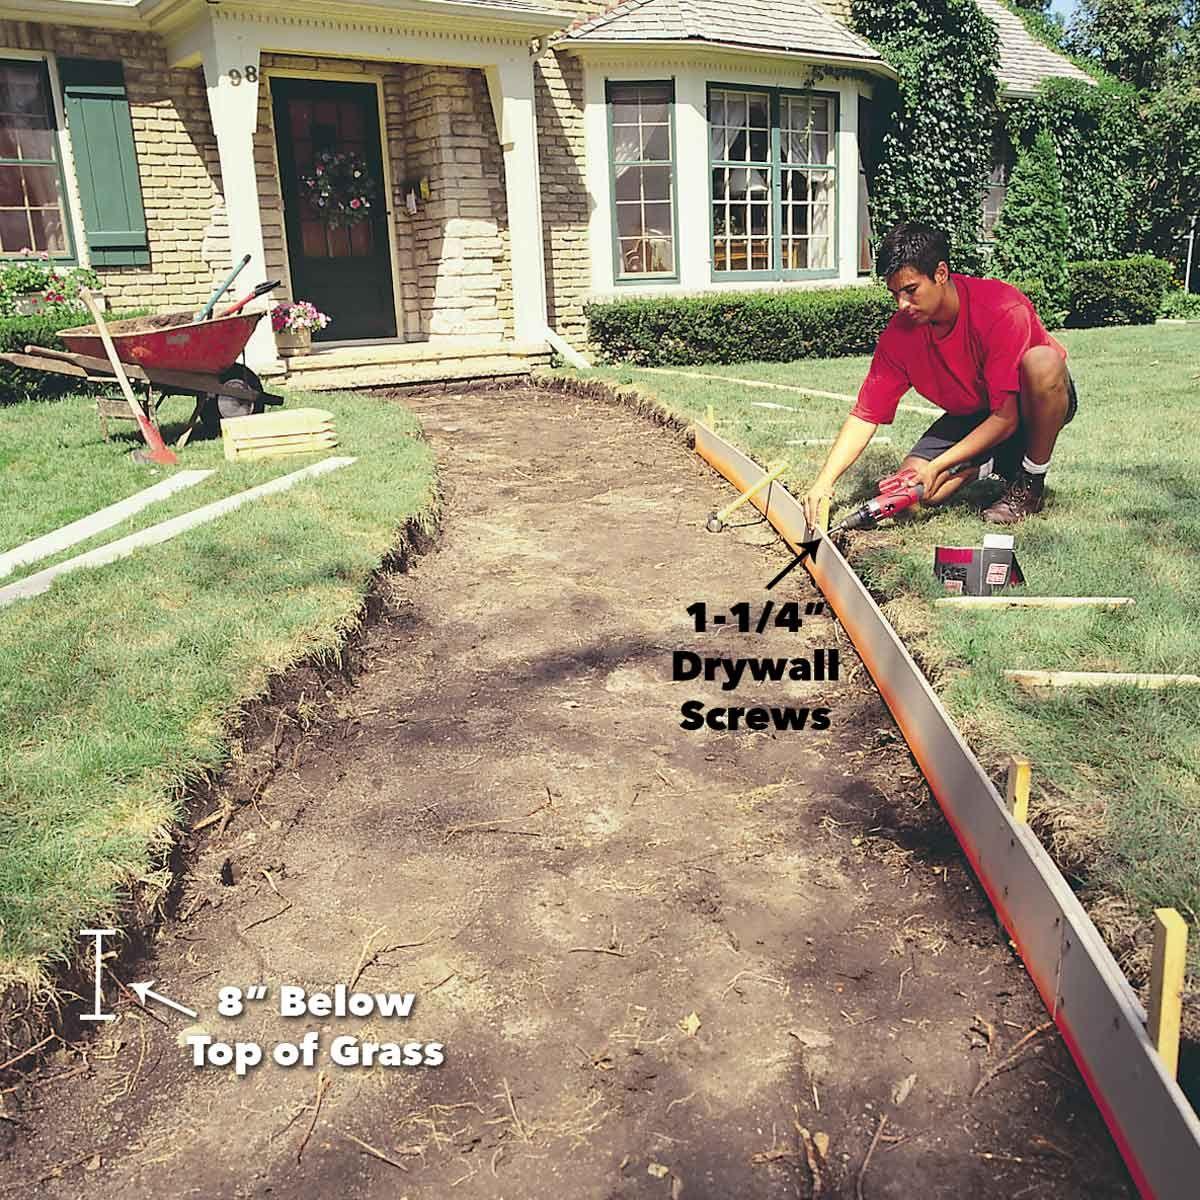 How To Pour A Concrete Sidewalk Poured Concrete Patio Concrete Walkway Stamped Concrete Walkway